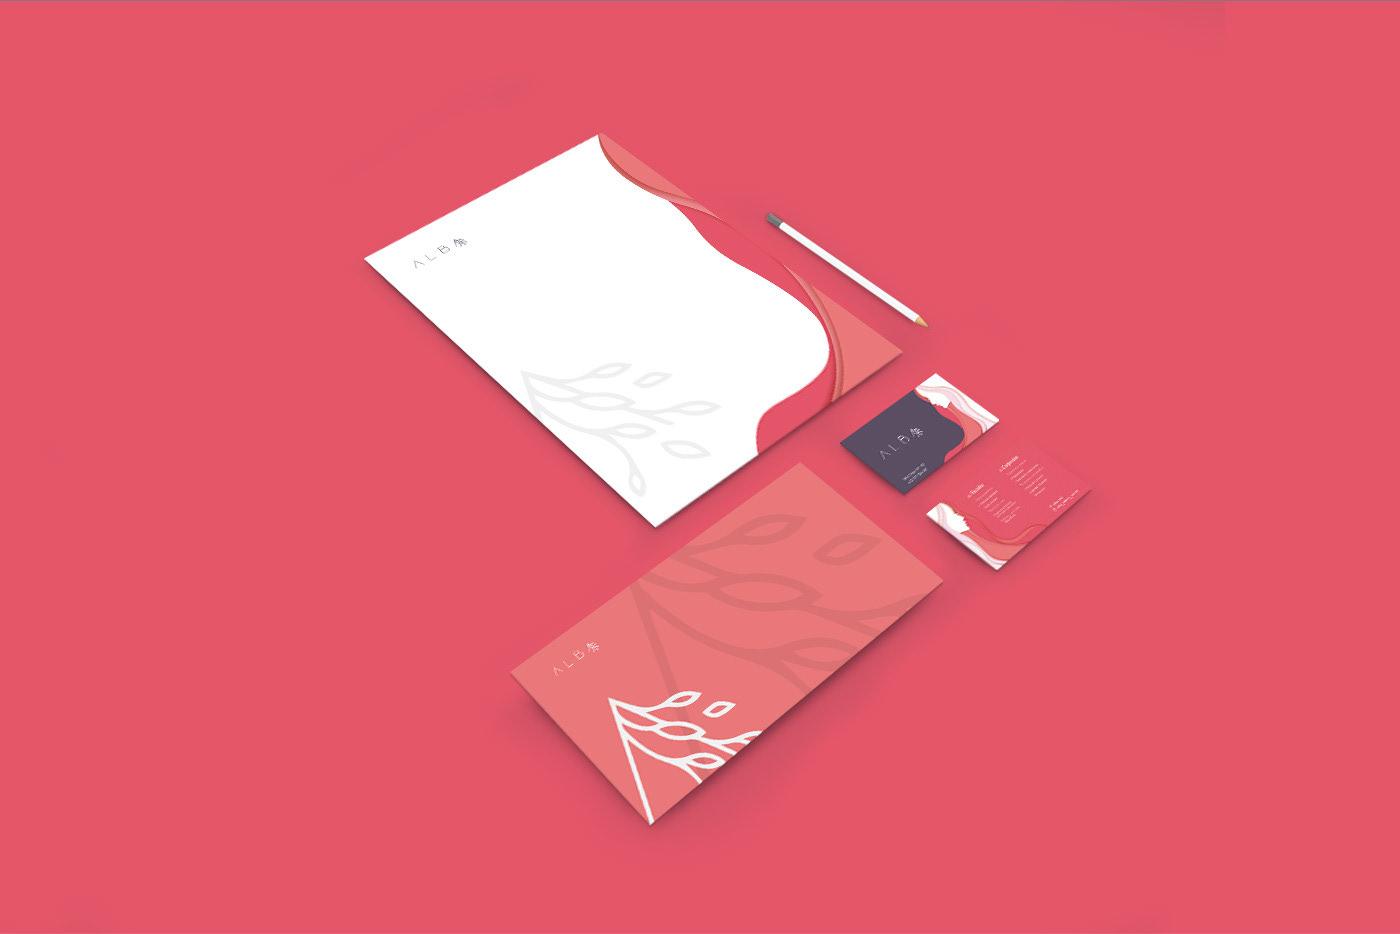 brand identity for alba made by tony hall